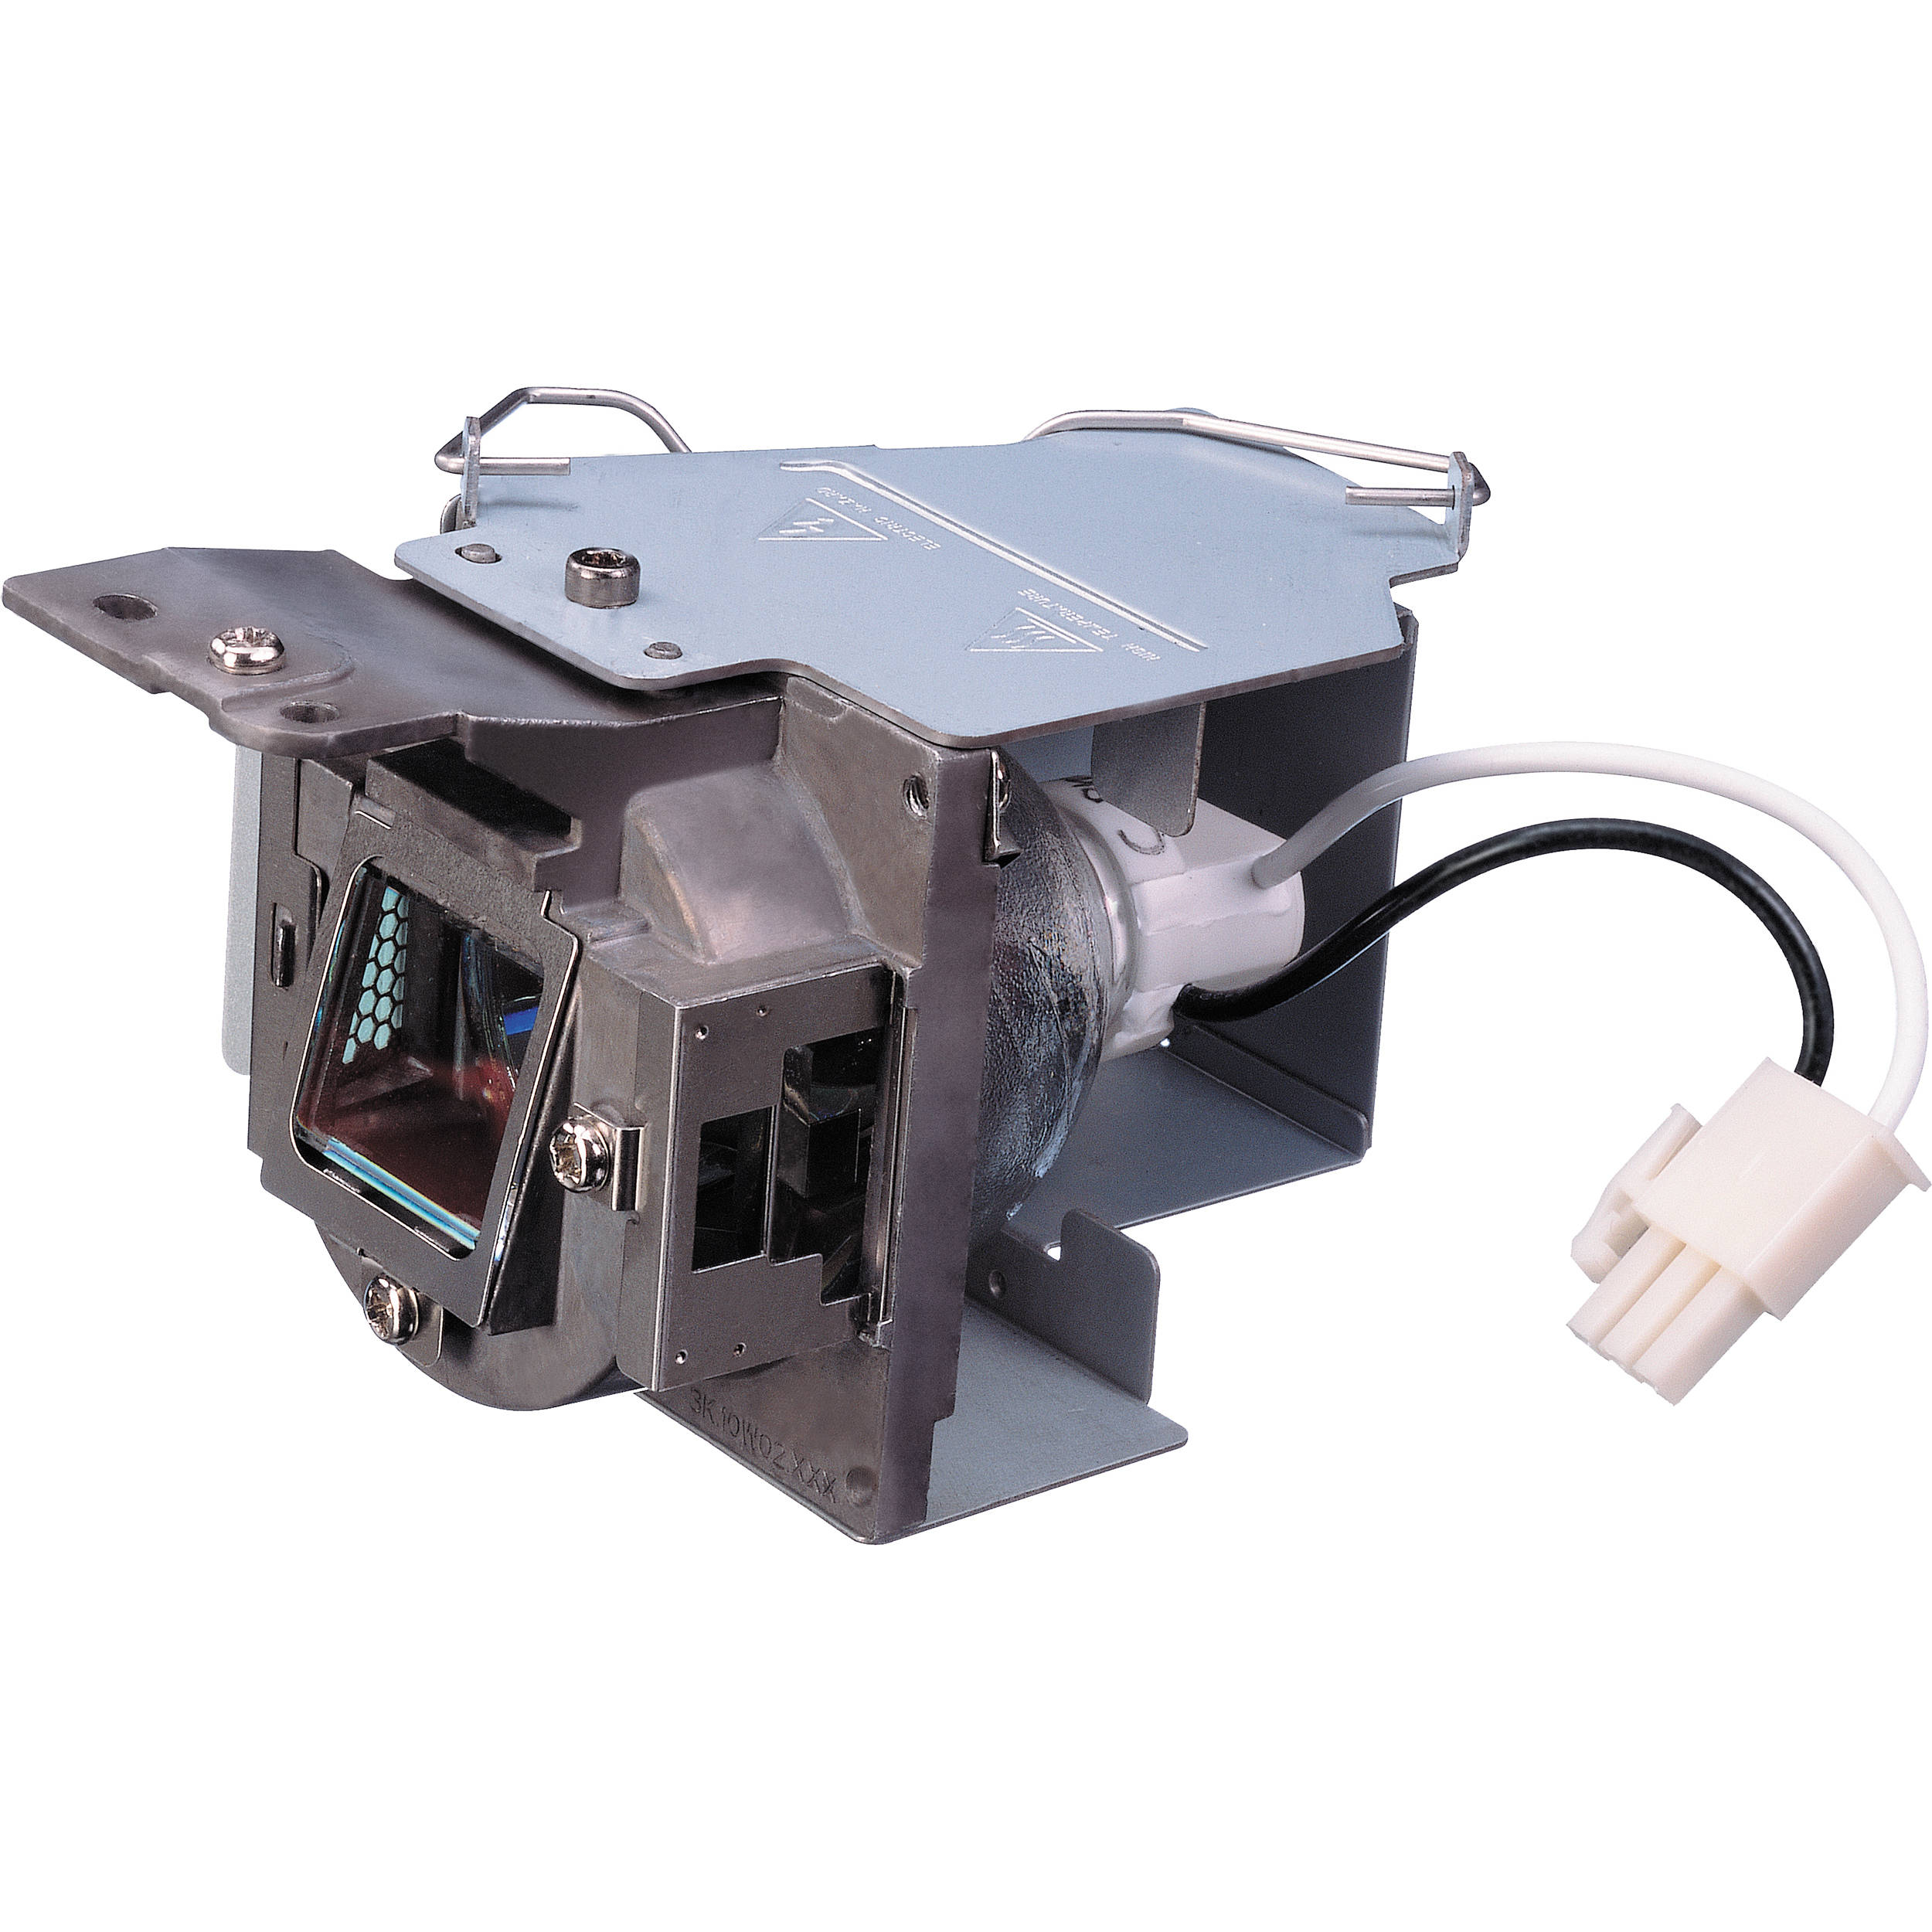 BenQ 5J.J4S05.001 Replacement Lamp for MW814ST 5J.J4S05.001 B&H